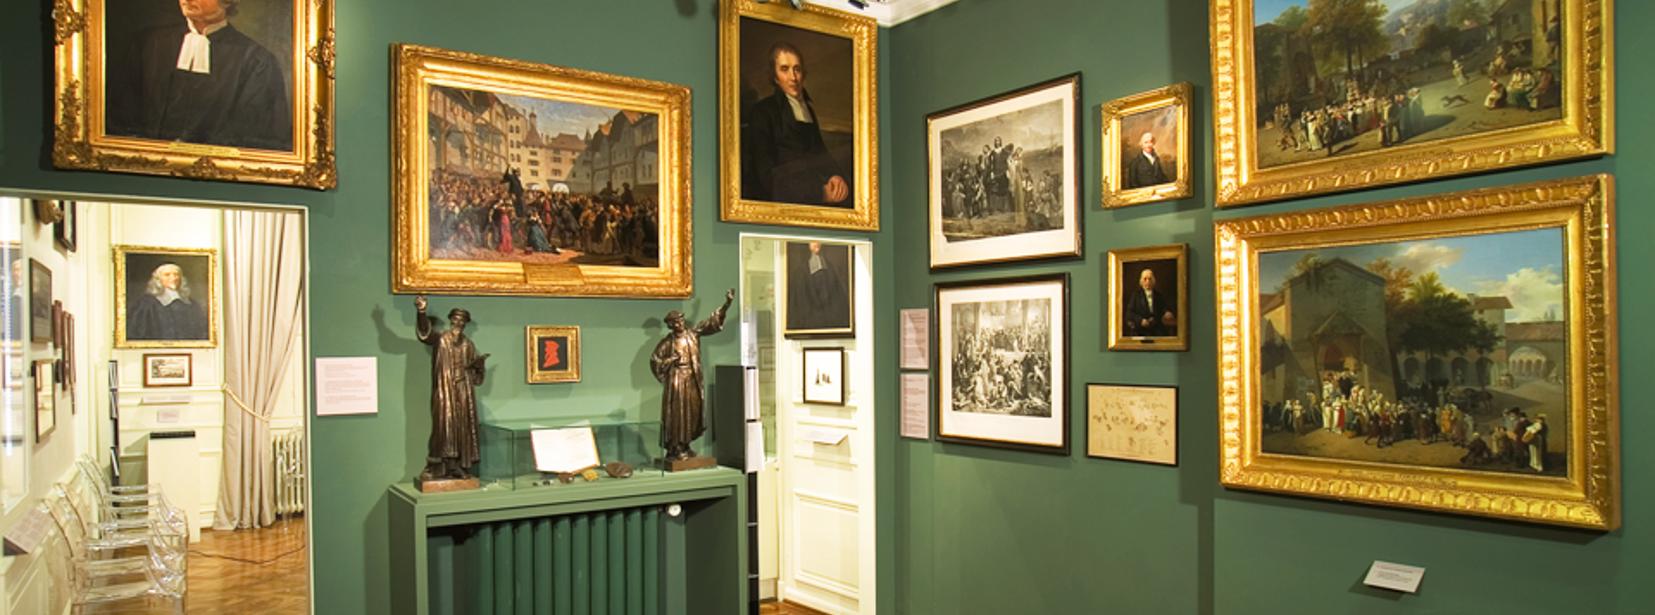 Image result for musée de la reforme images